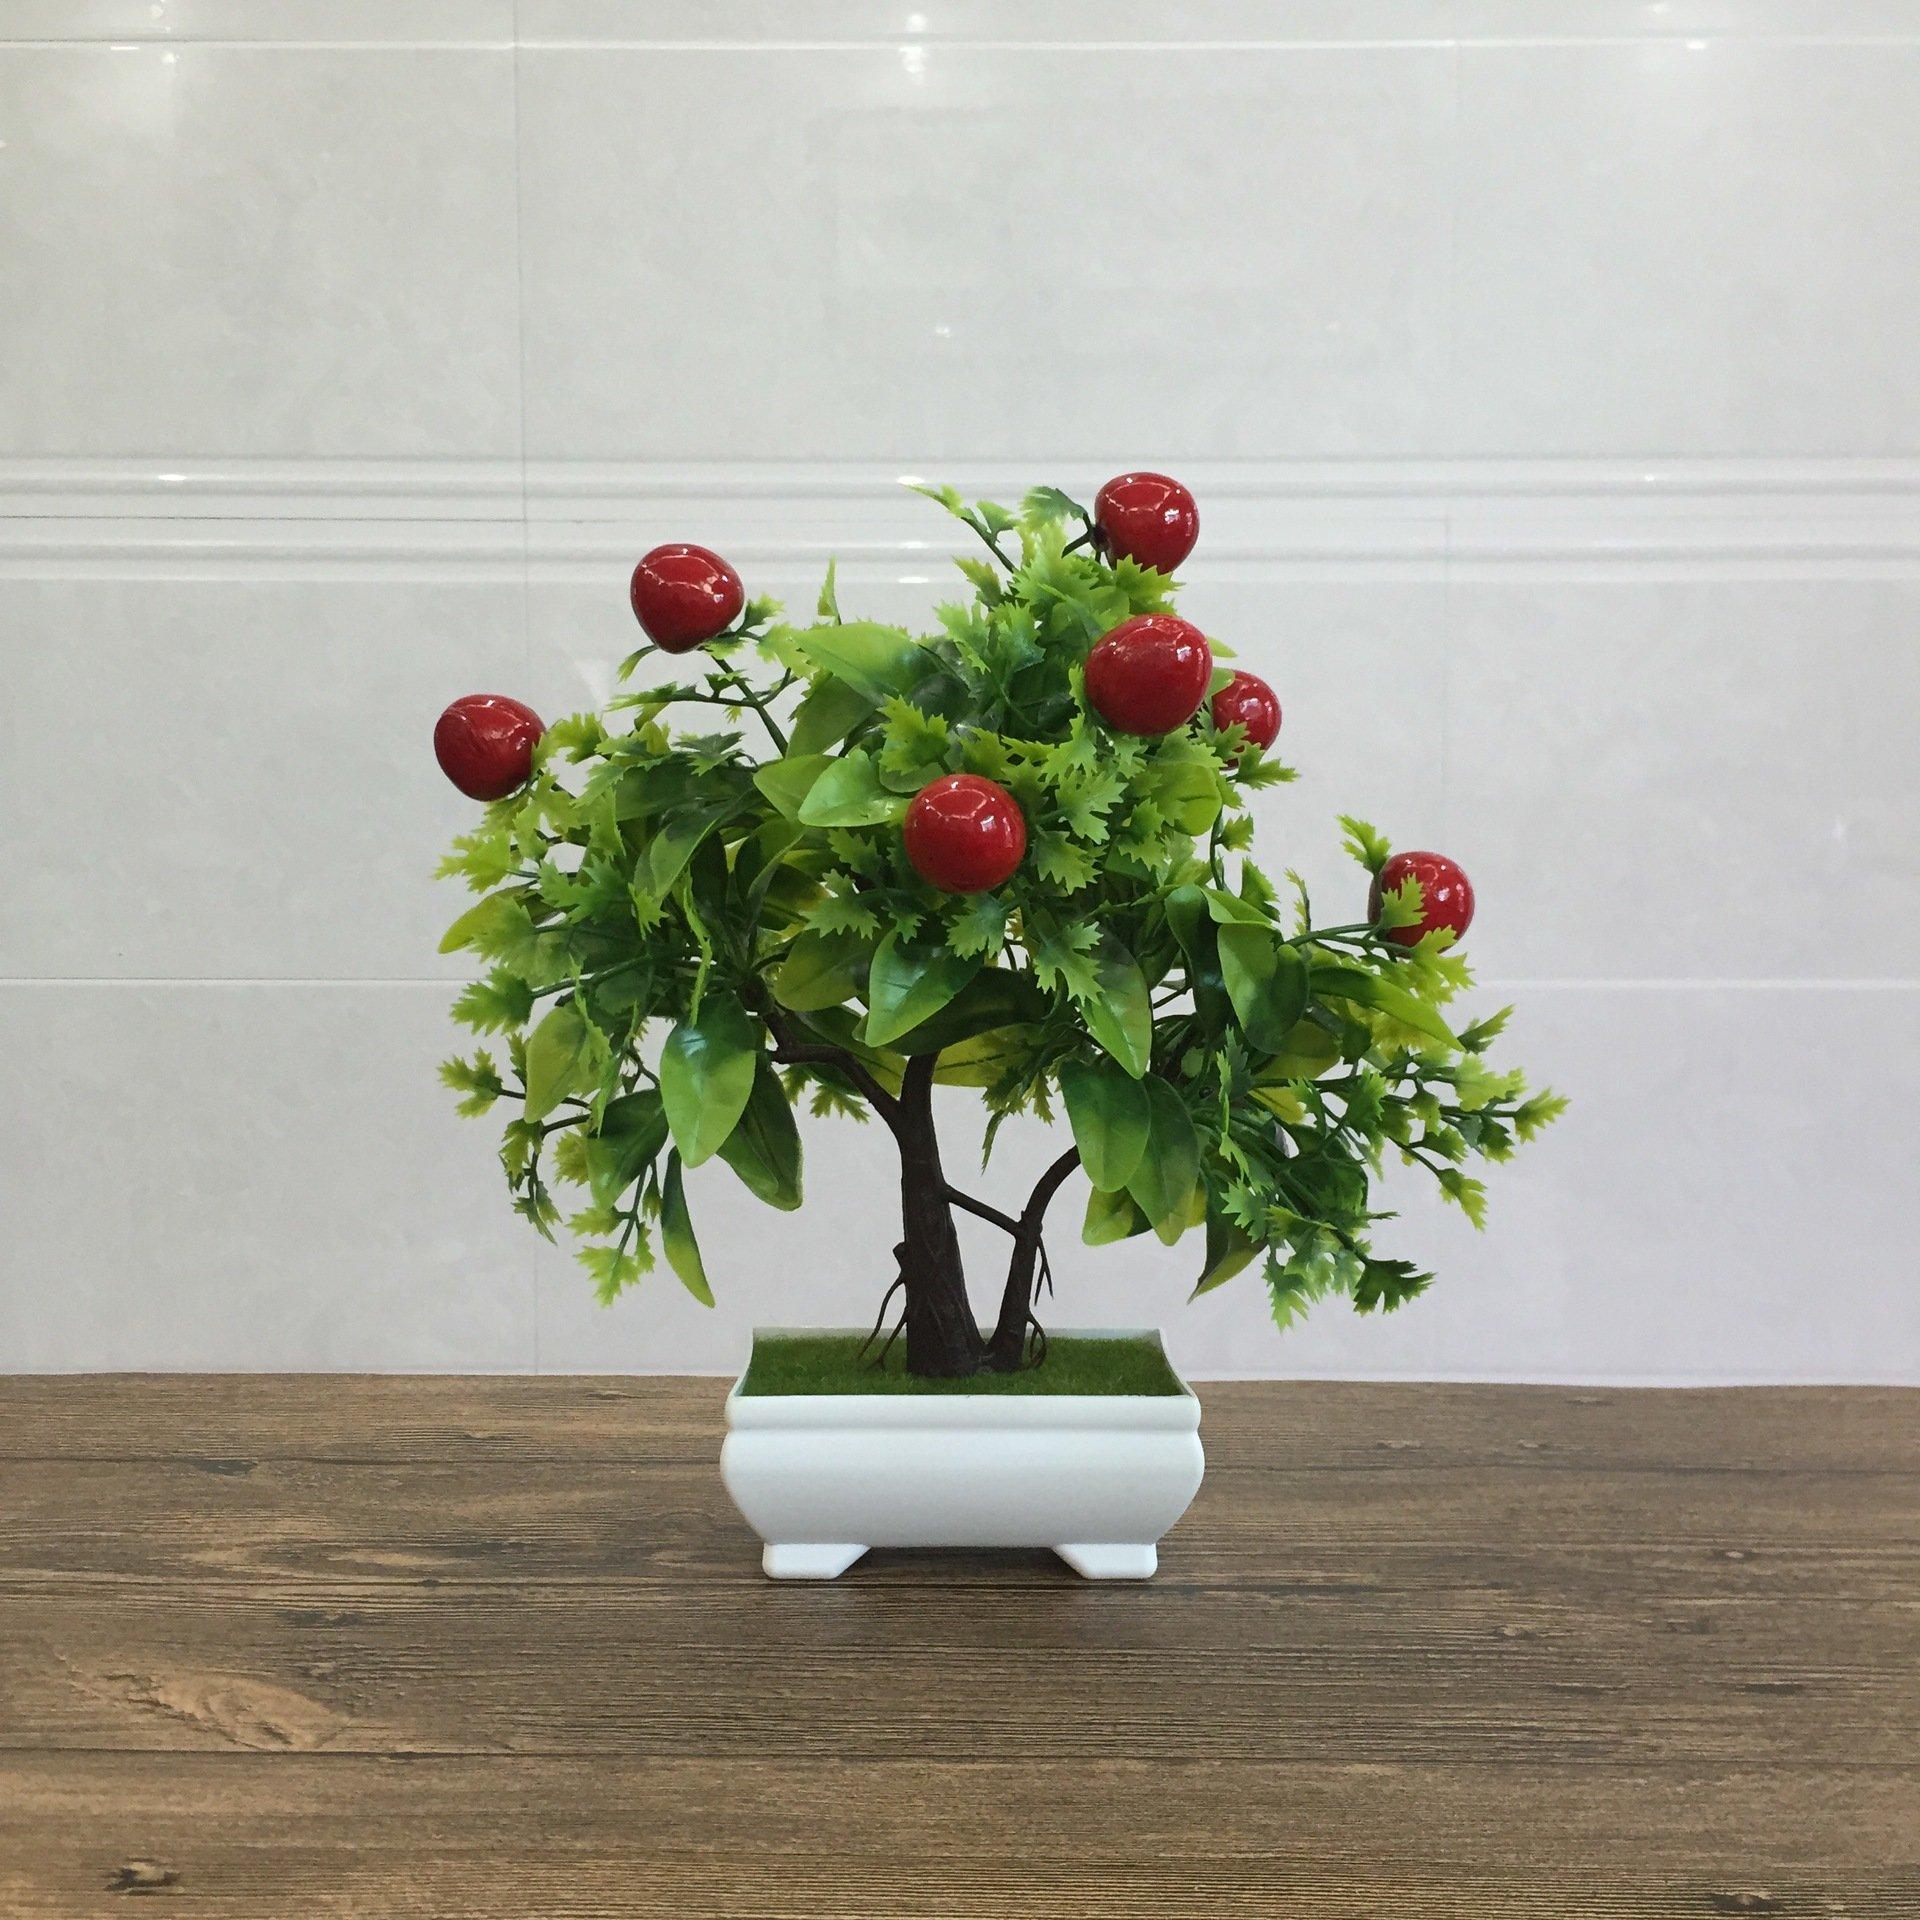 Artificial Fruit Orange Apple Lemon Tree Bonsai For Wedding Party Home Decoration Fake Green Pot Plants Flowers Ornaments Cherry Buy Online In Bosnia And Herzegovina At Bosnia Desertcart Com Productid 174110764